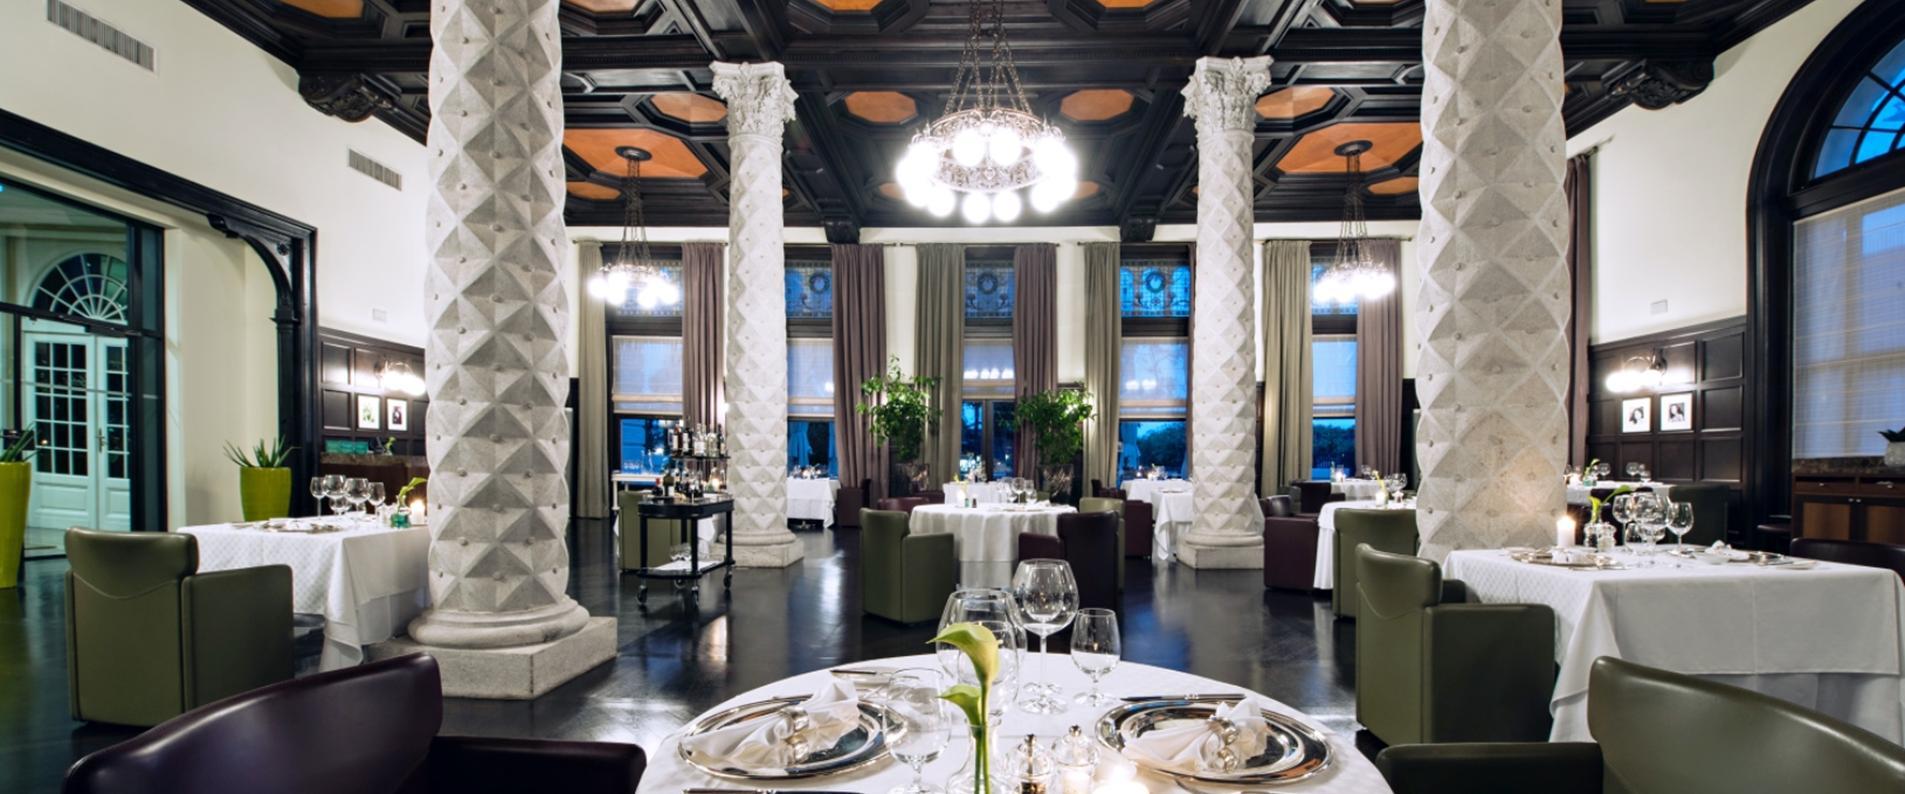 restaurant-sophia-kempinski-palace-portoroz